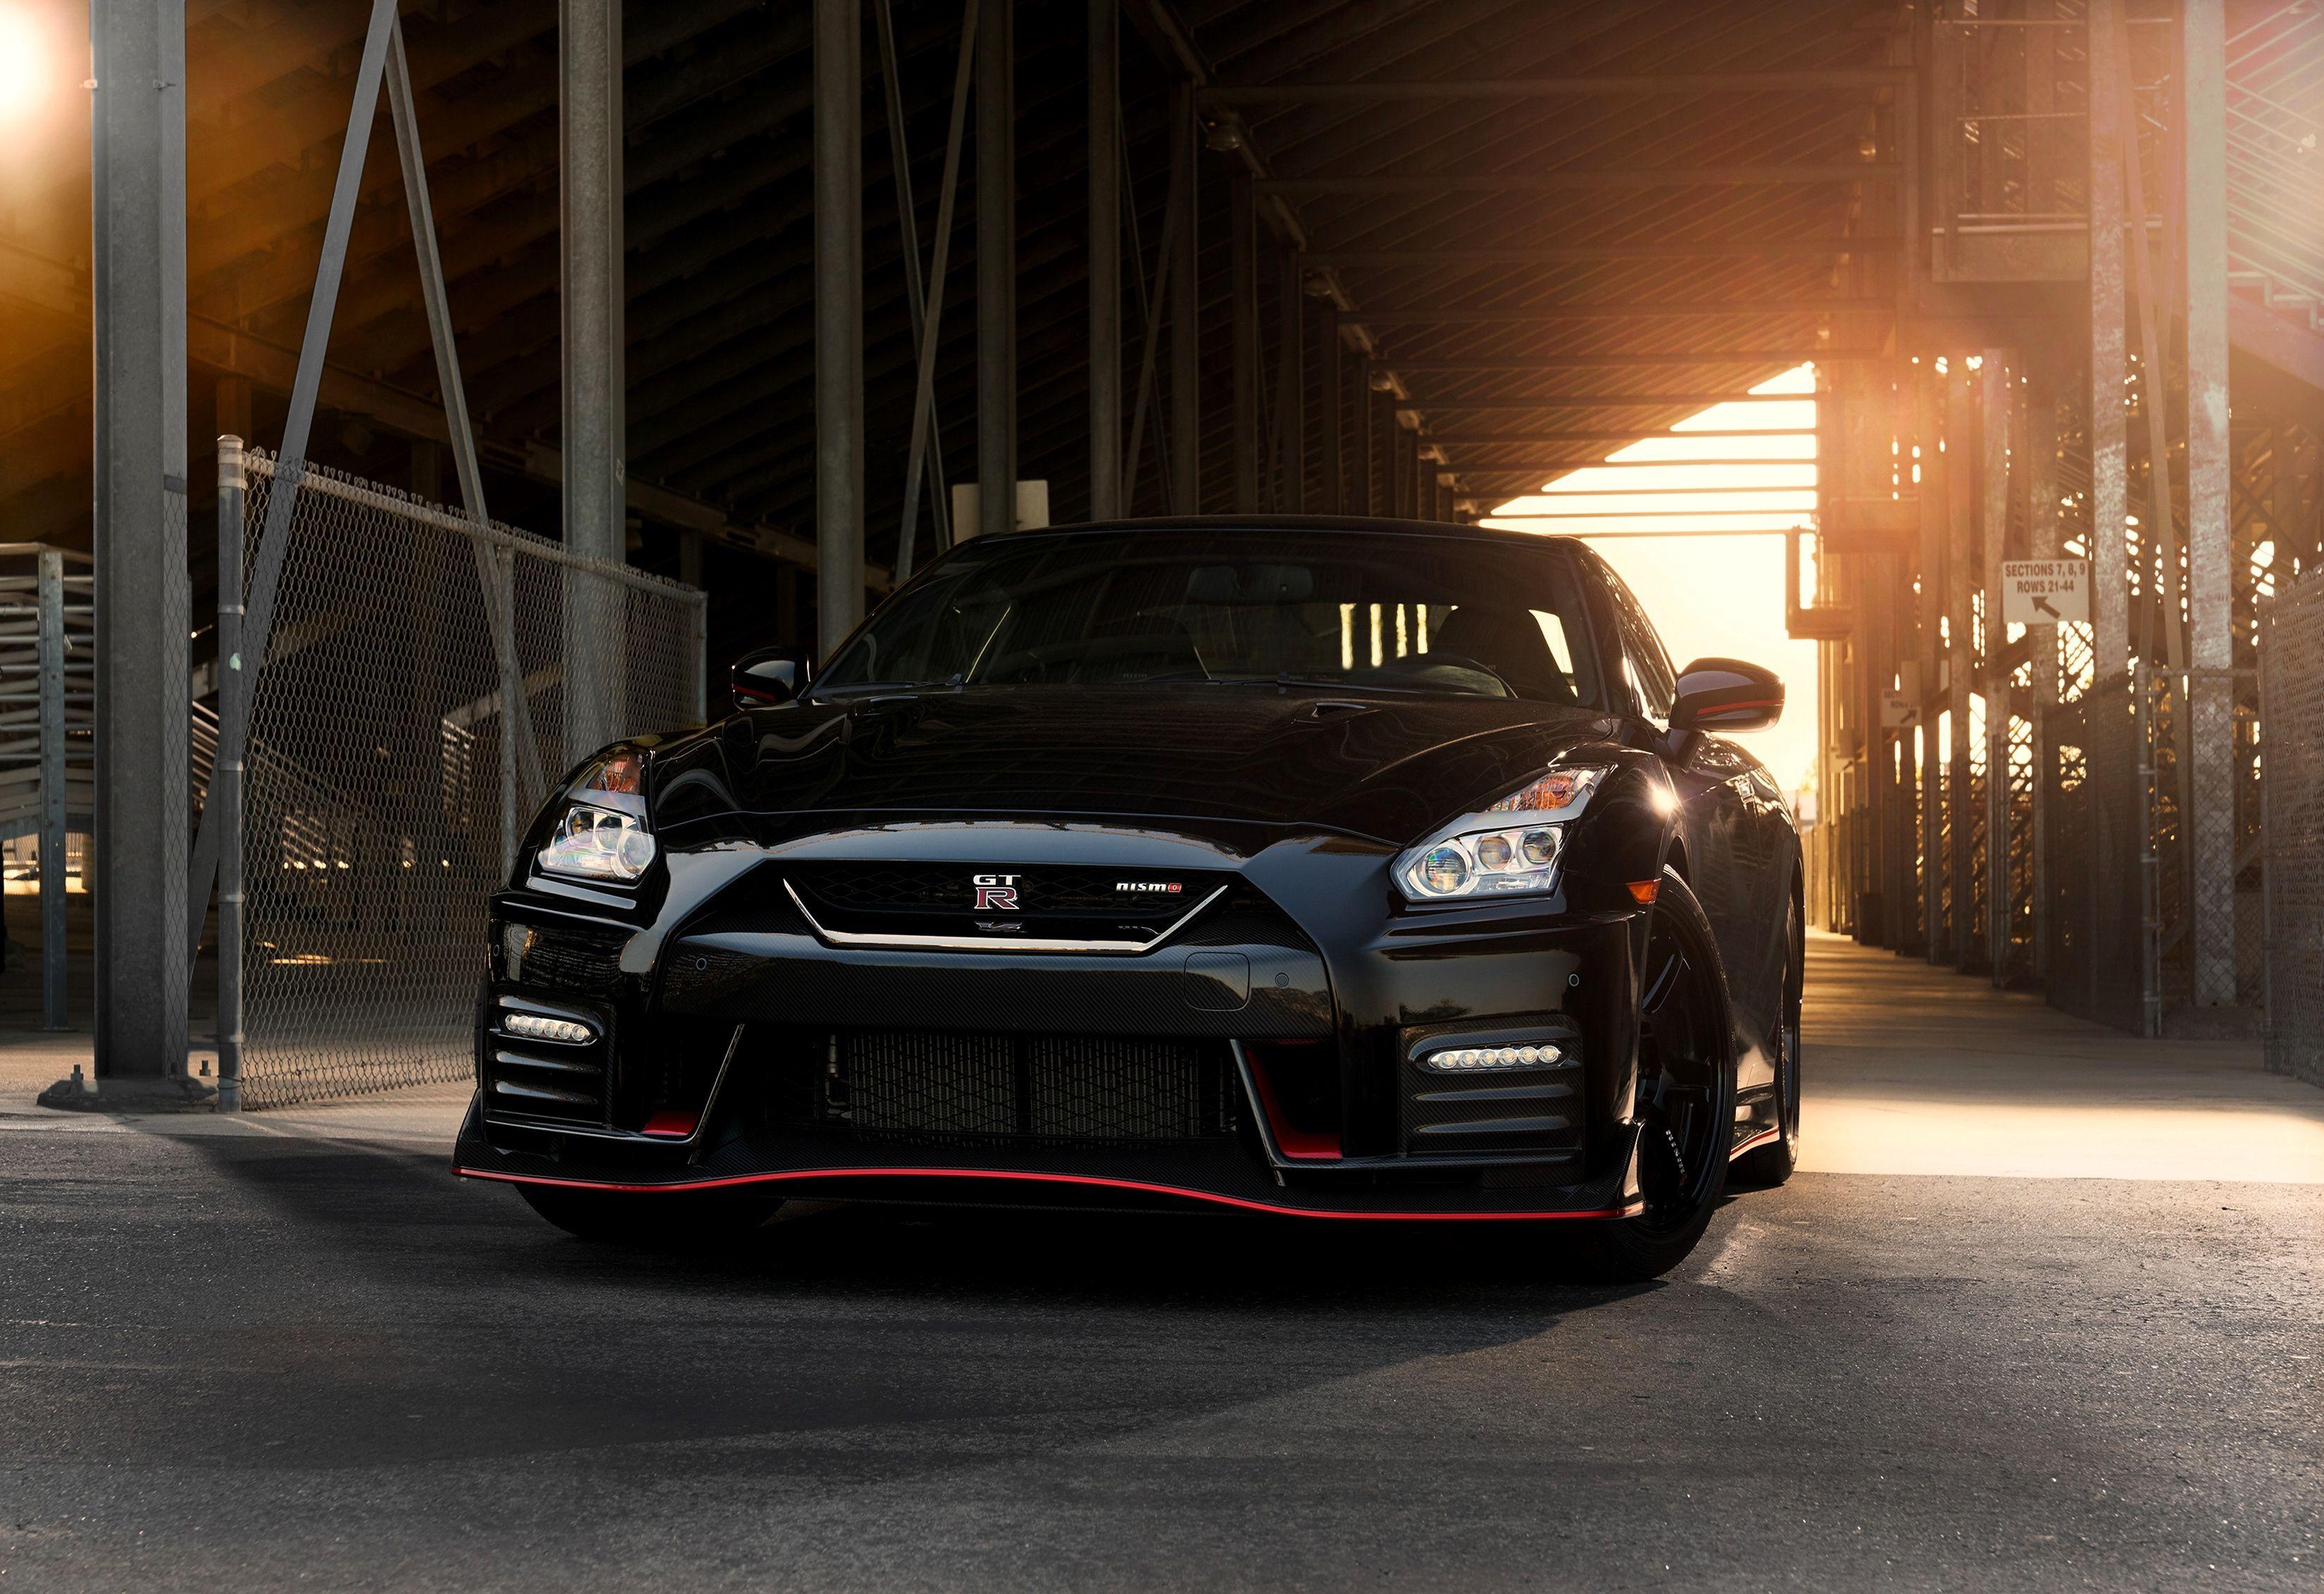 Black Nissan GTR Background Wallpaper 71679 3300x2264px 3300x2264